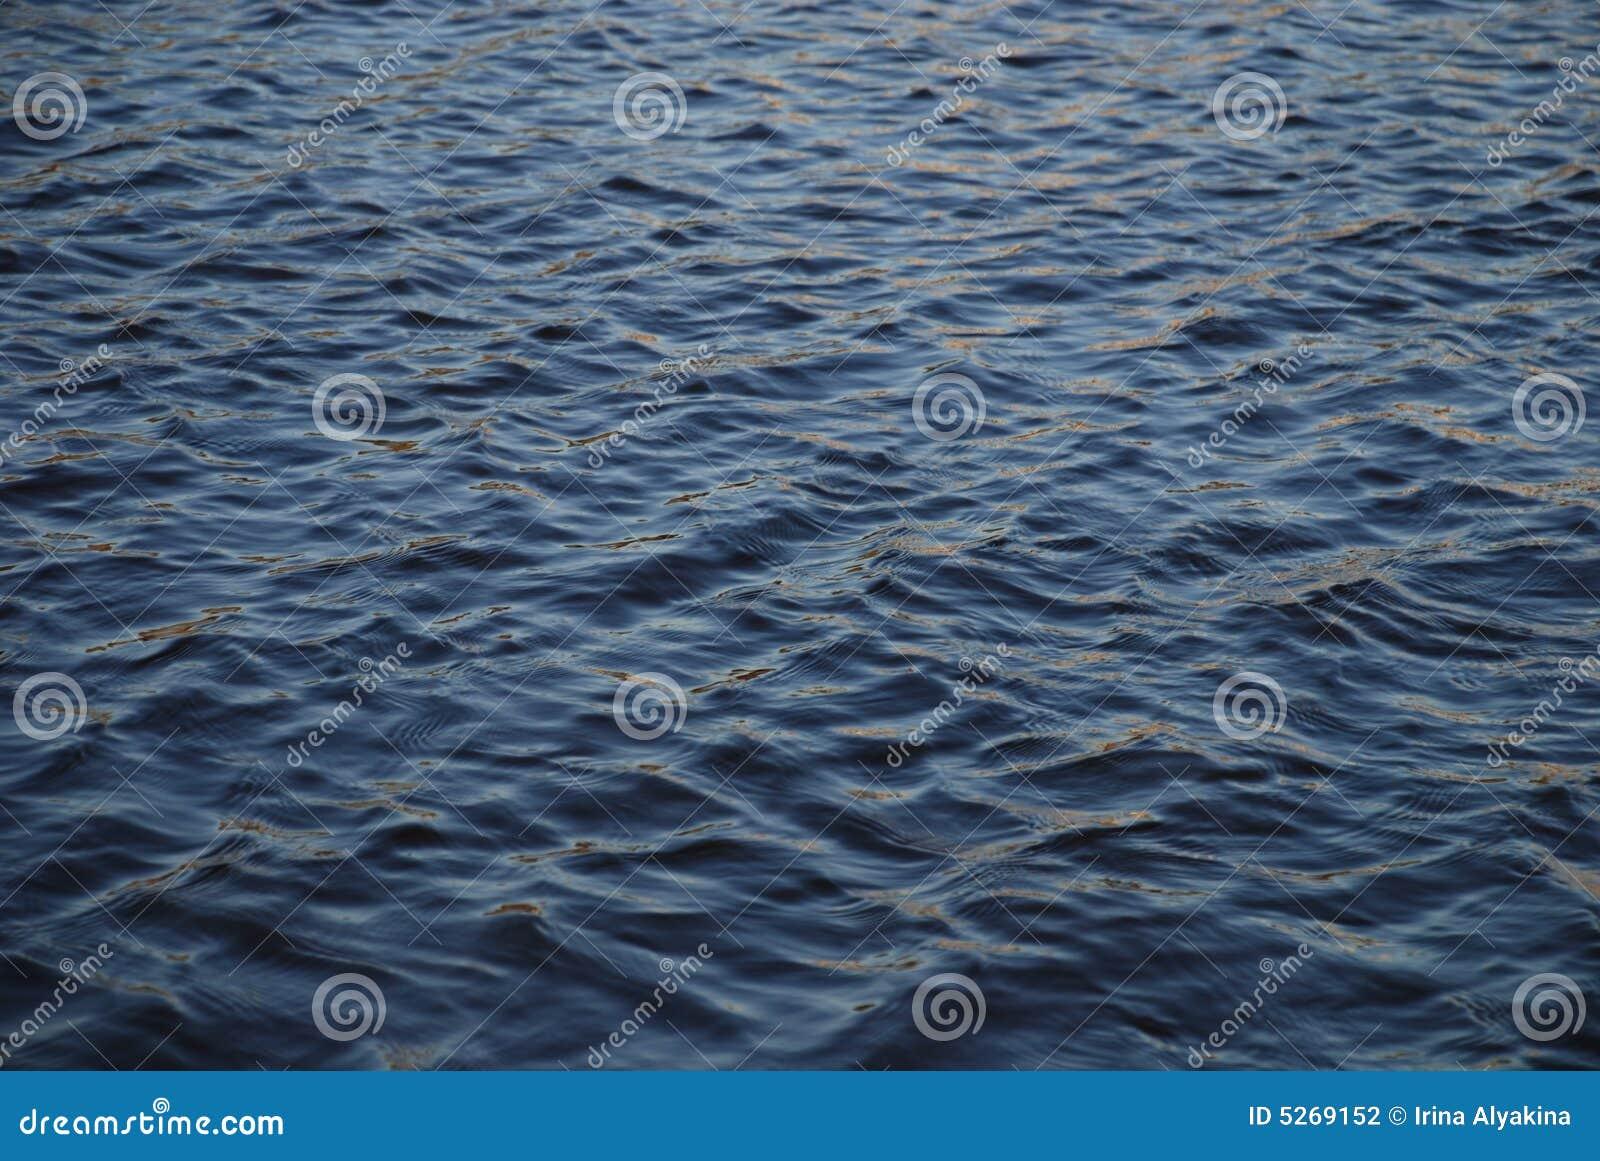 Mörkt vatten